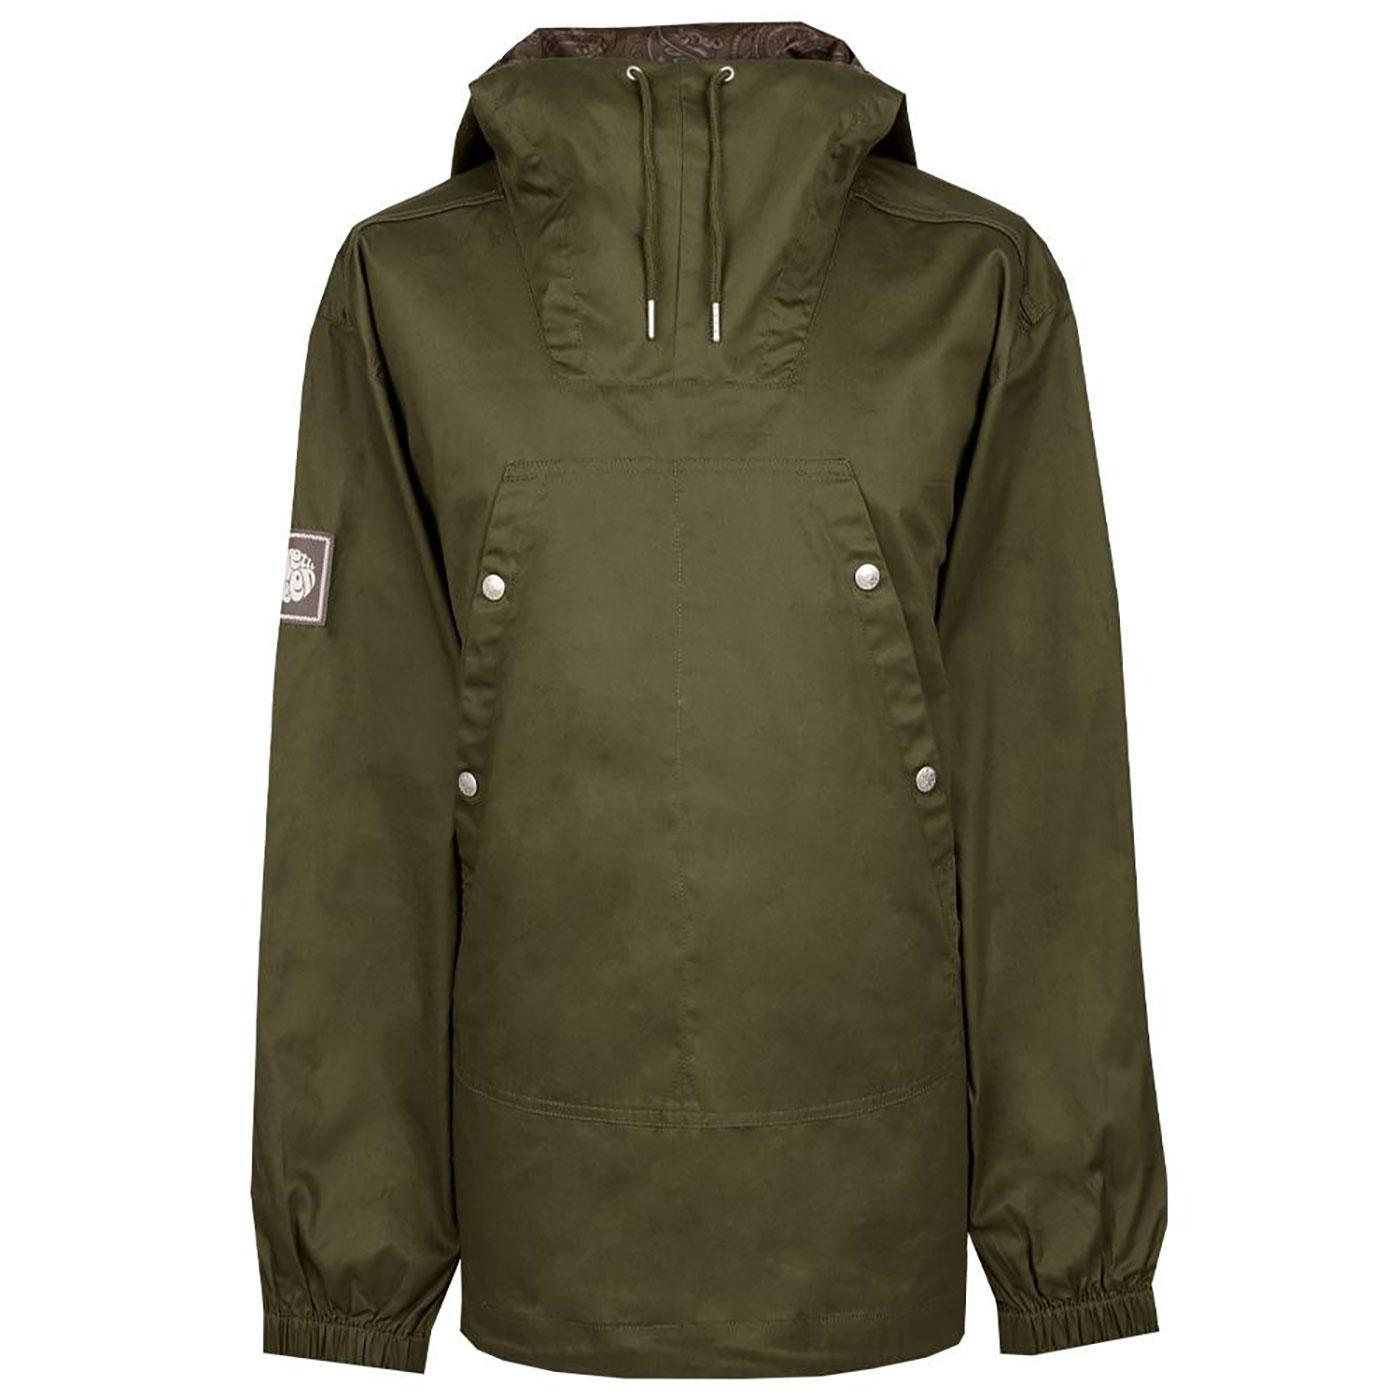 PRETTY GREEN Mens Retro 90's Overhead Jacket G